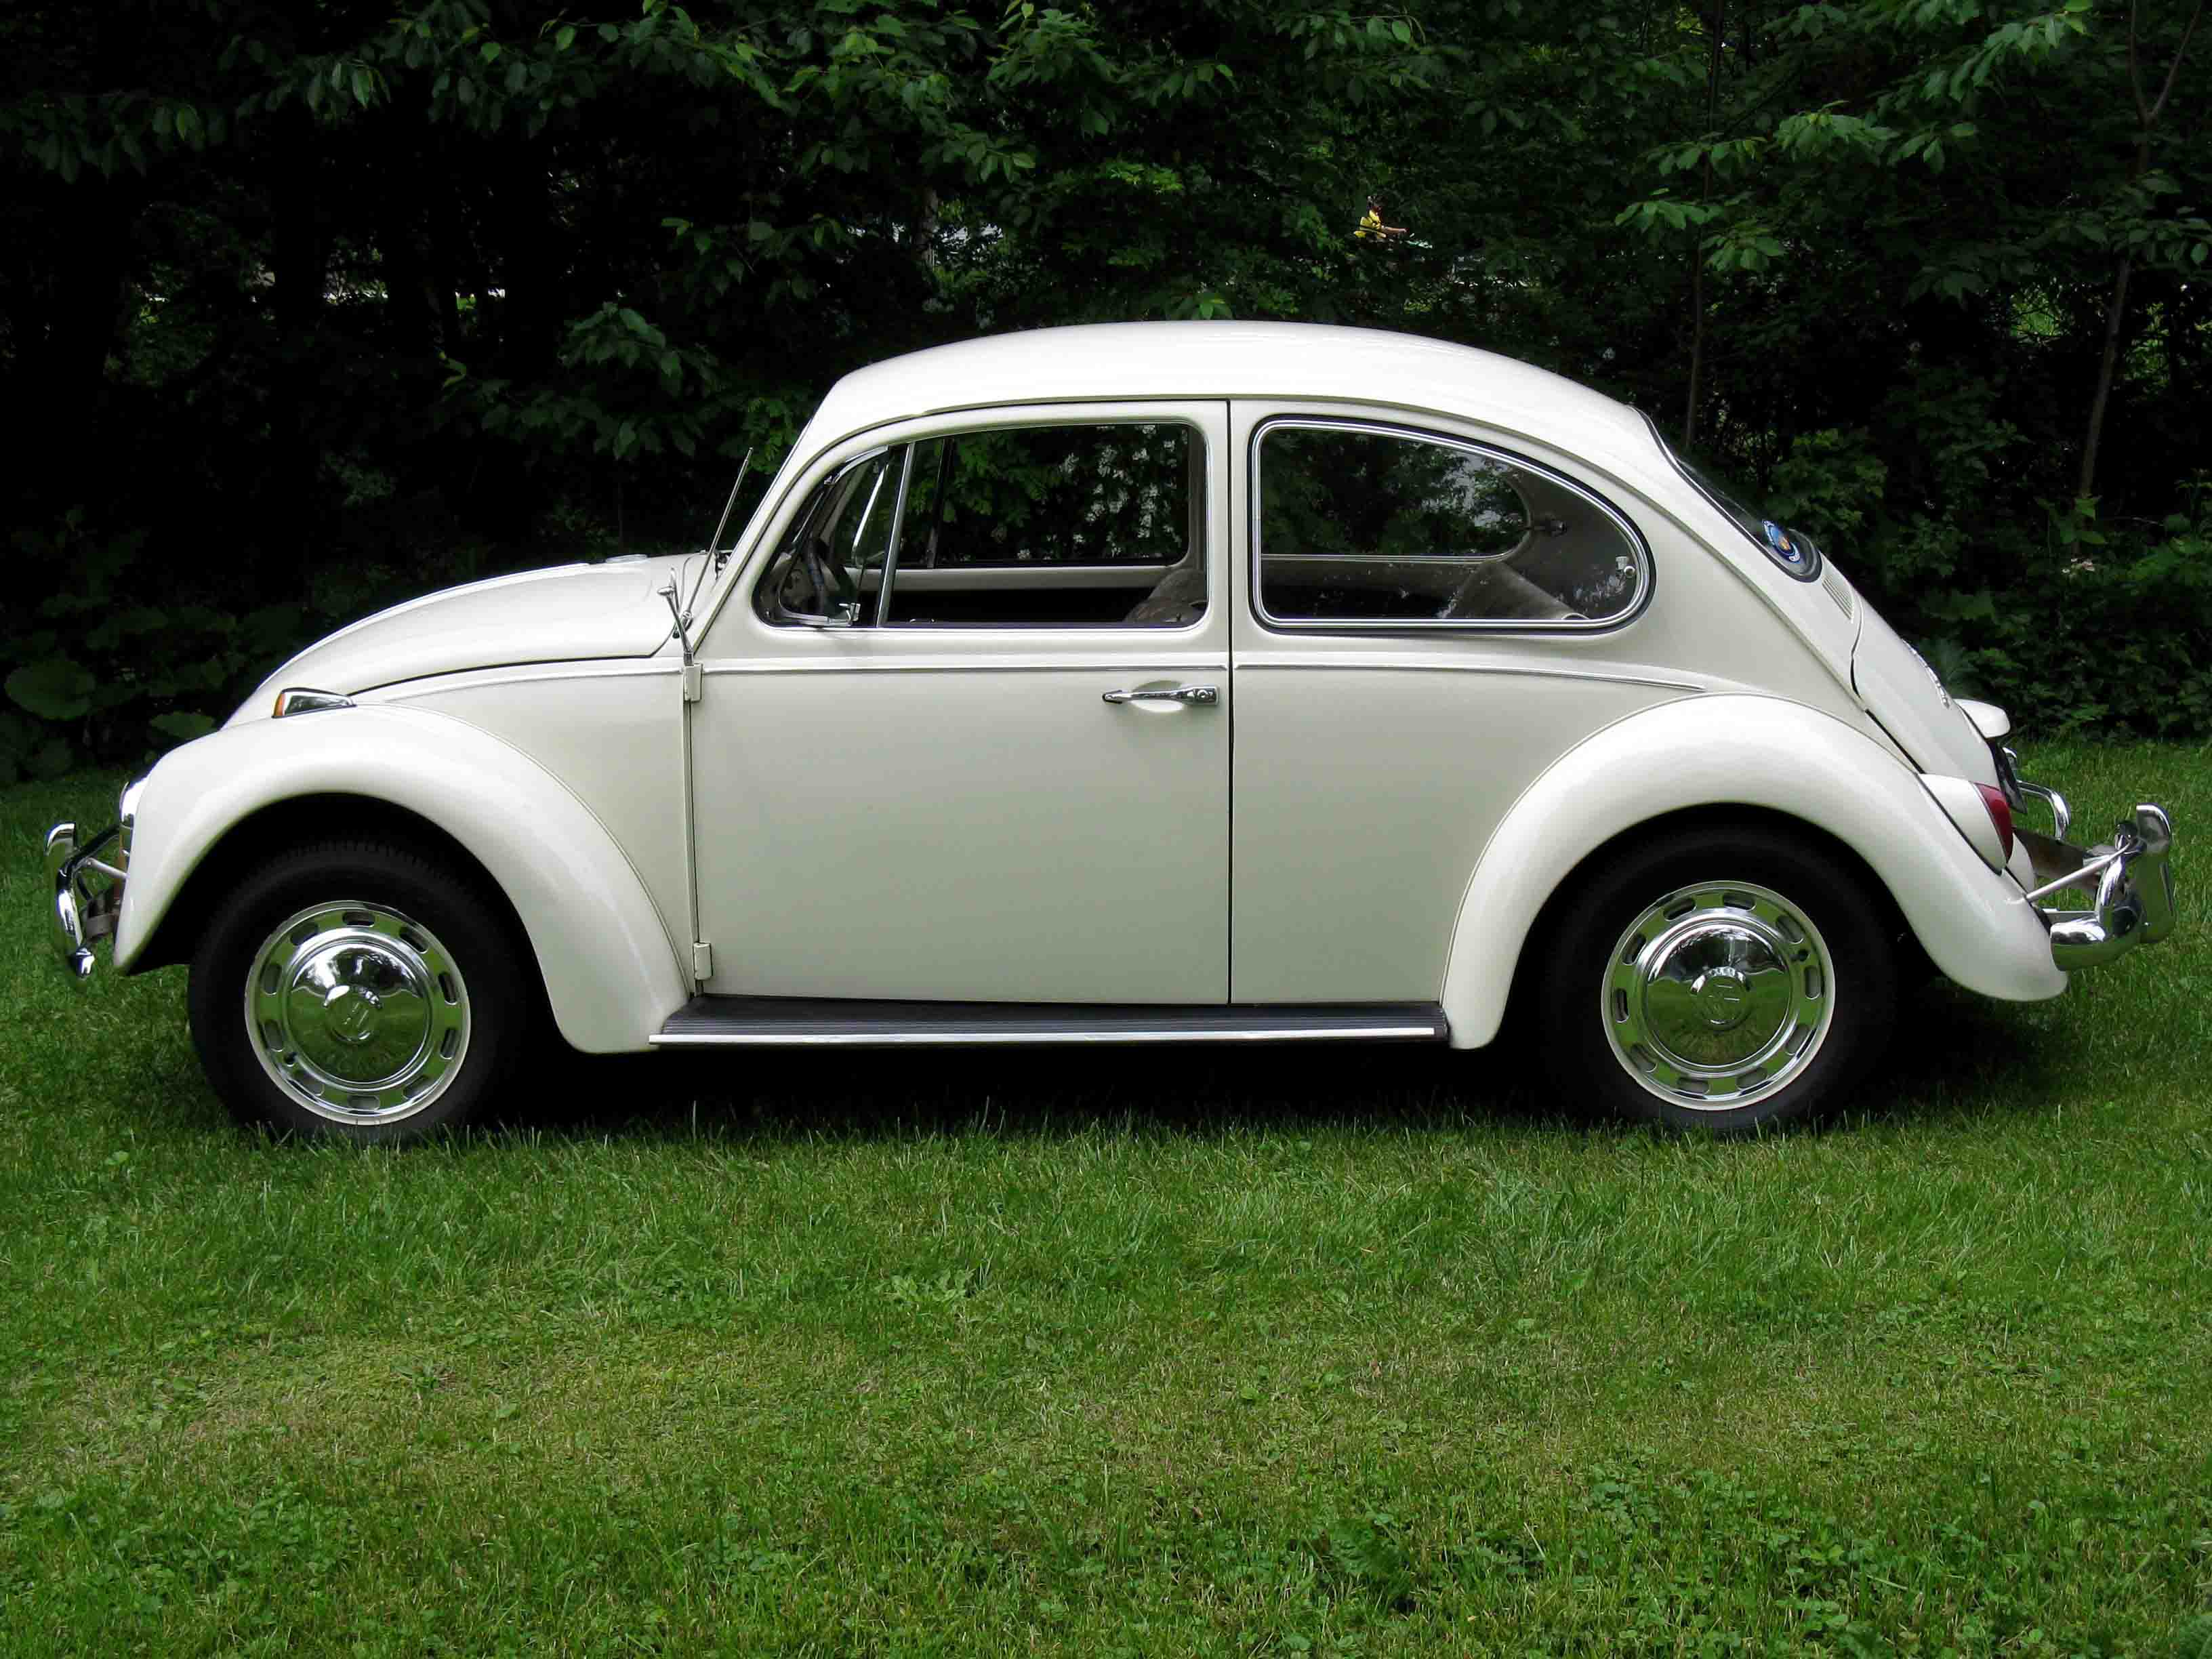 Sold L282 Lotus White 67 Beetle 1967 Vw Beetle